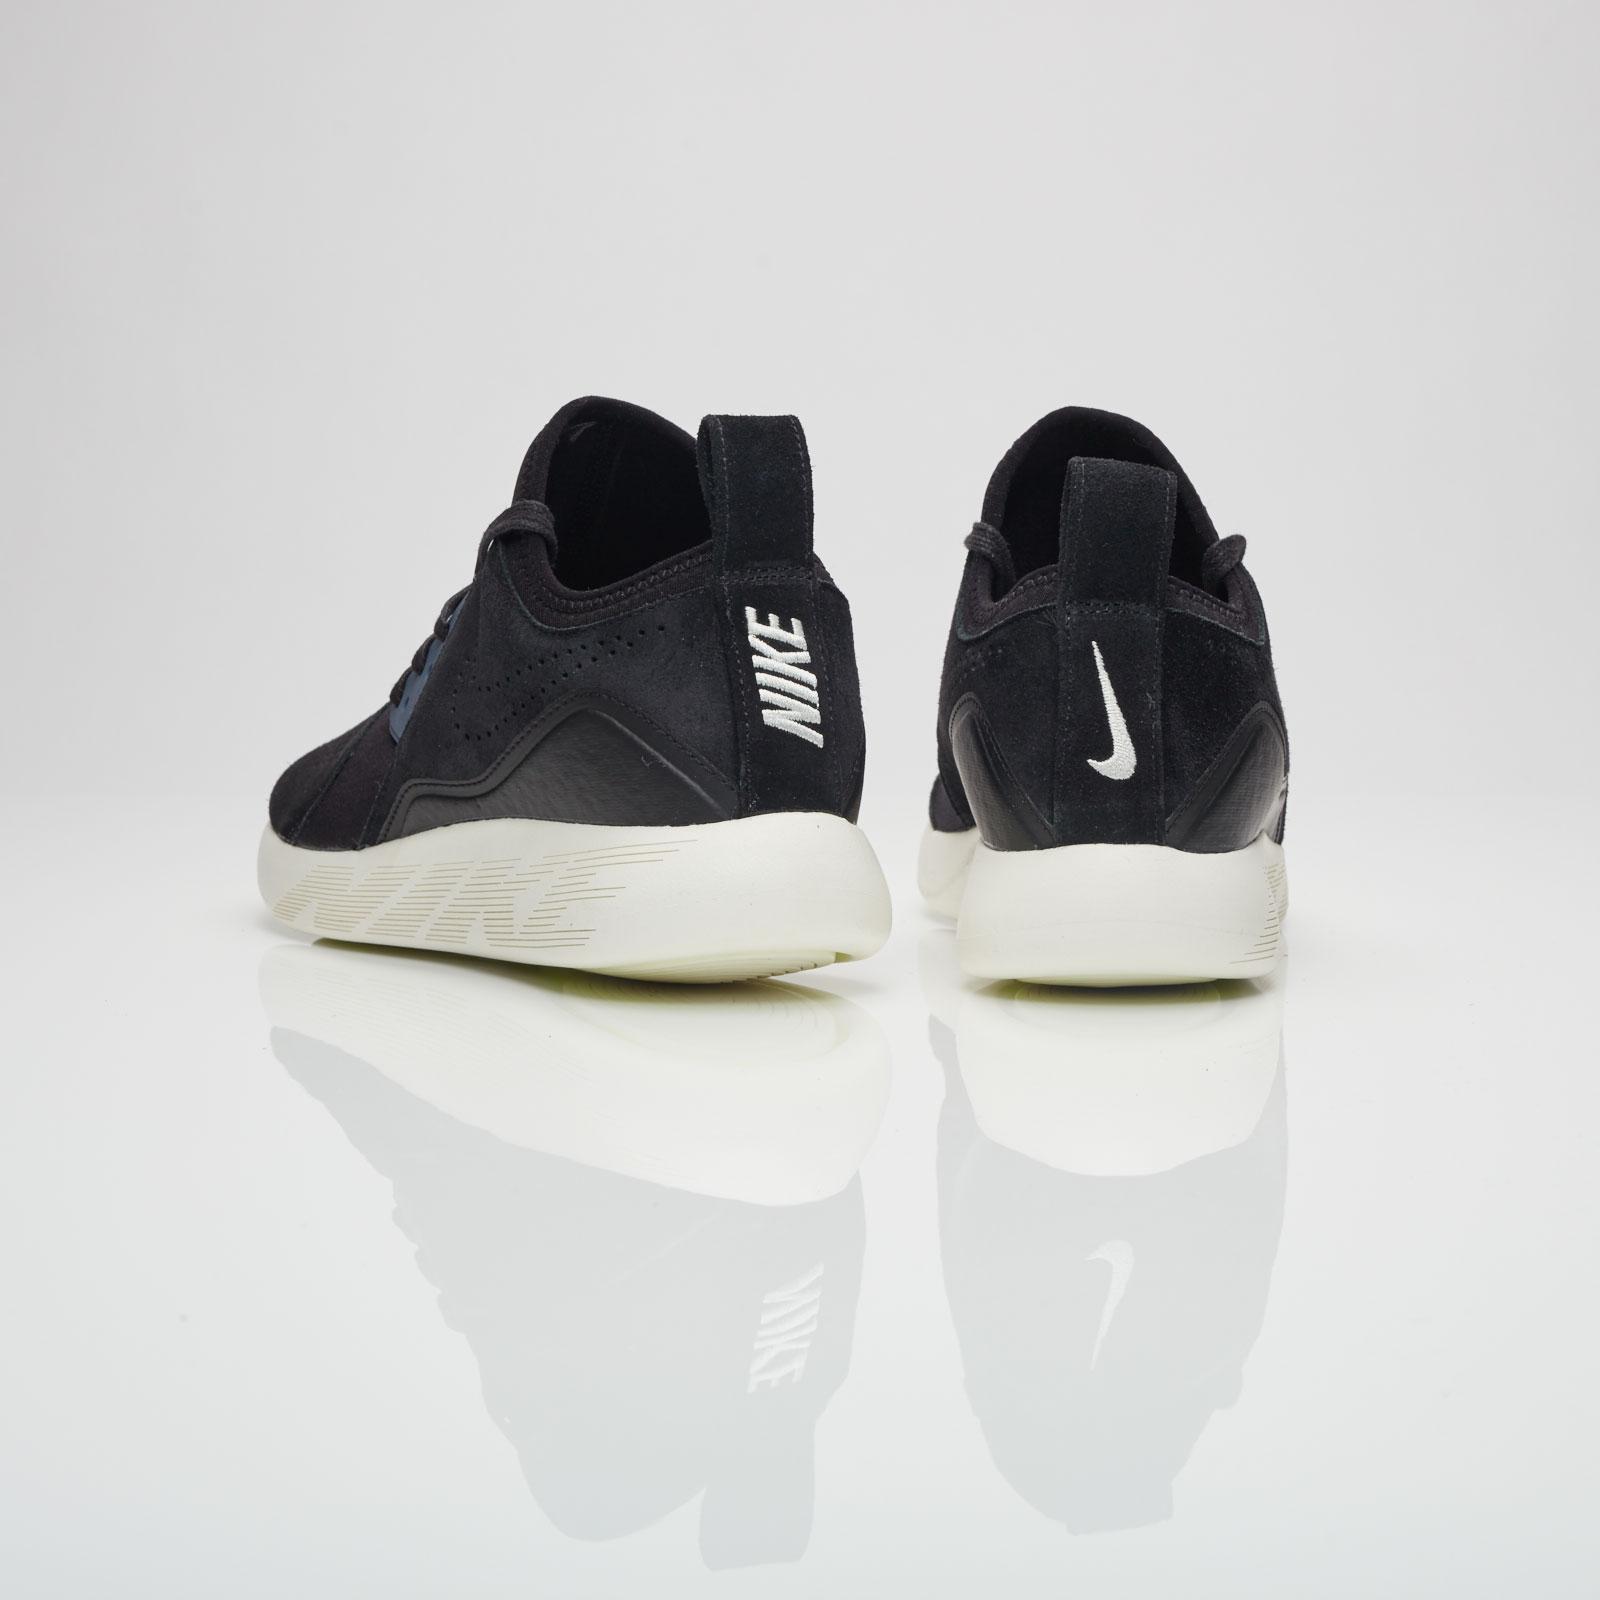 Nike Sportswear Lunarcharge Premium Nike Sportswear Lunarcharge Premium ... 5ae35cdf0